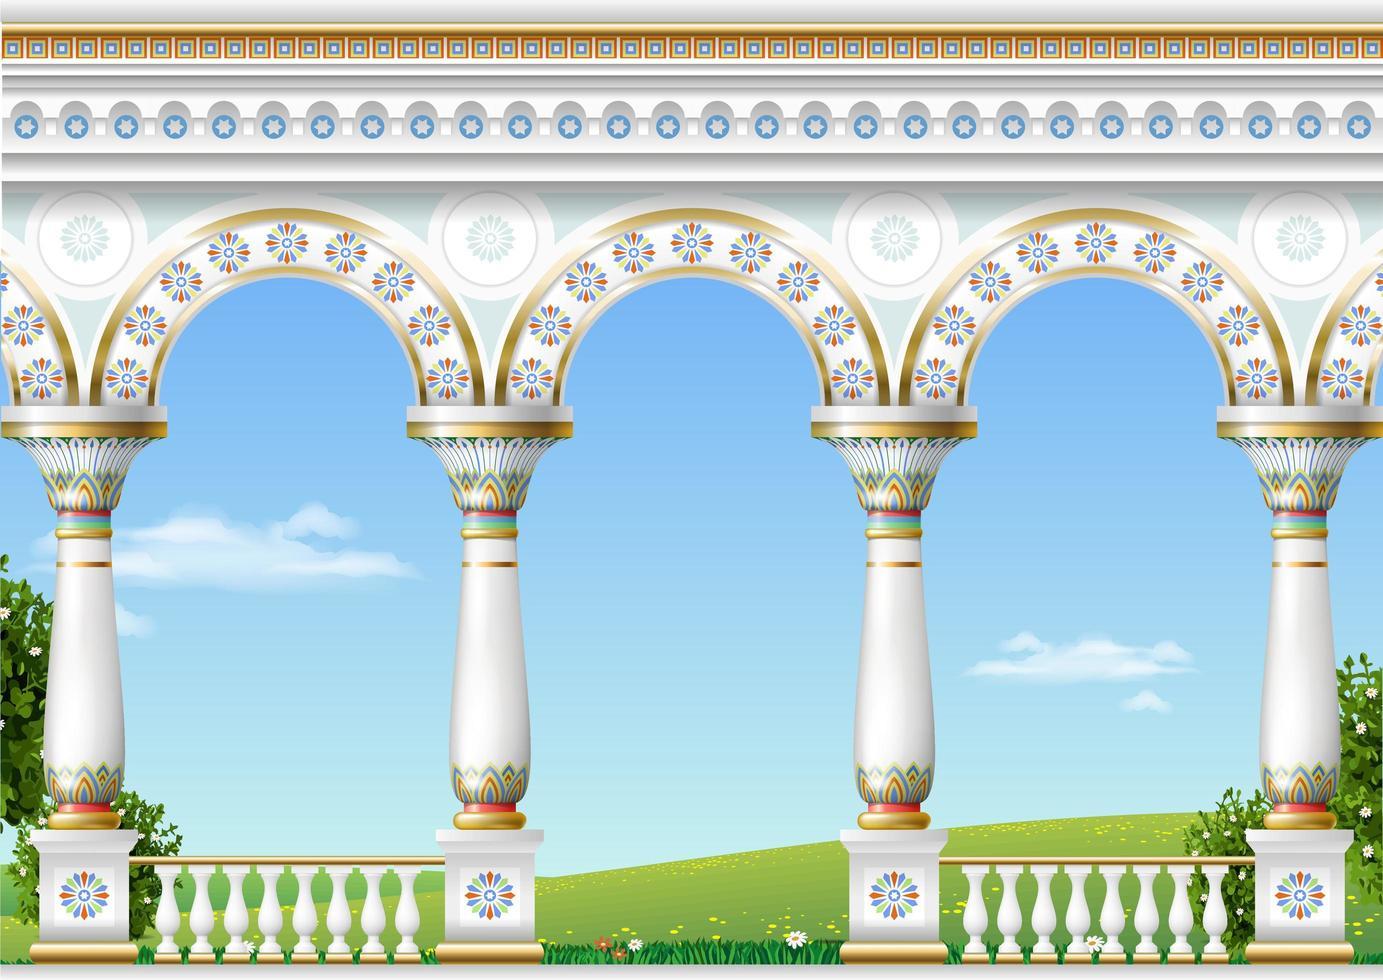 balkong i ett fantastiskt palats i östlig klassisk stil vektor